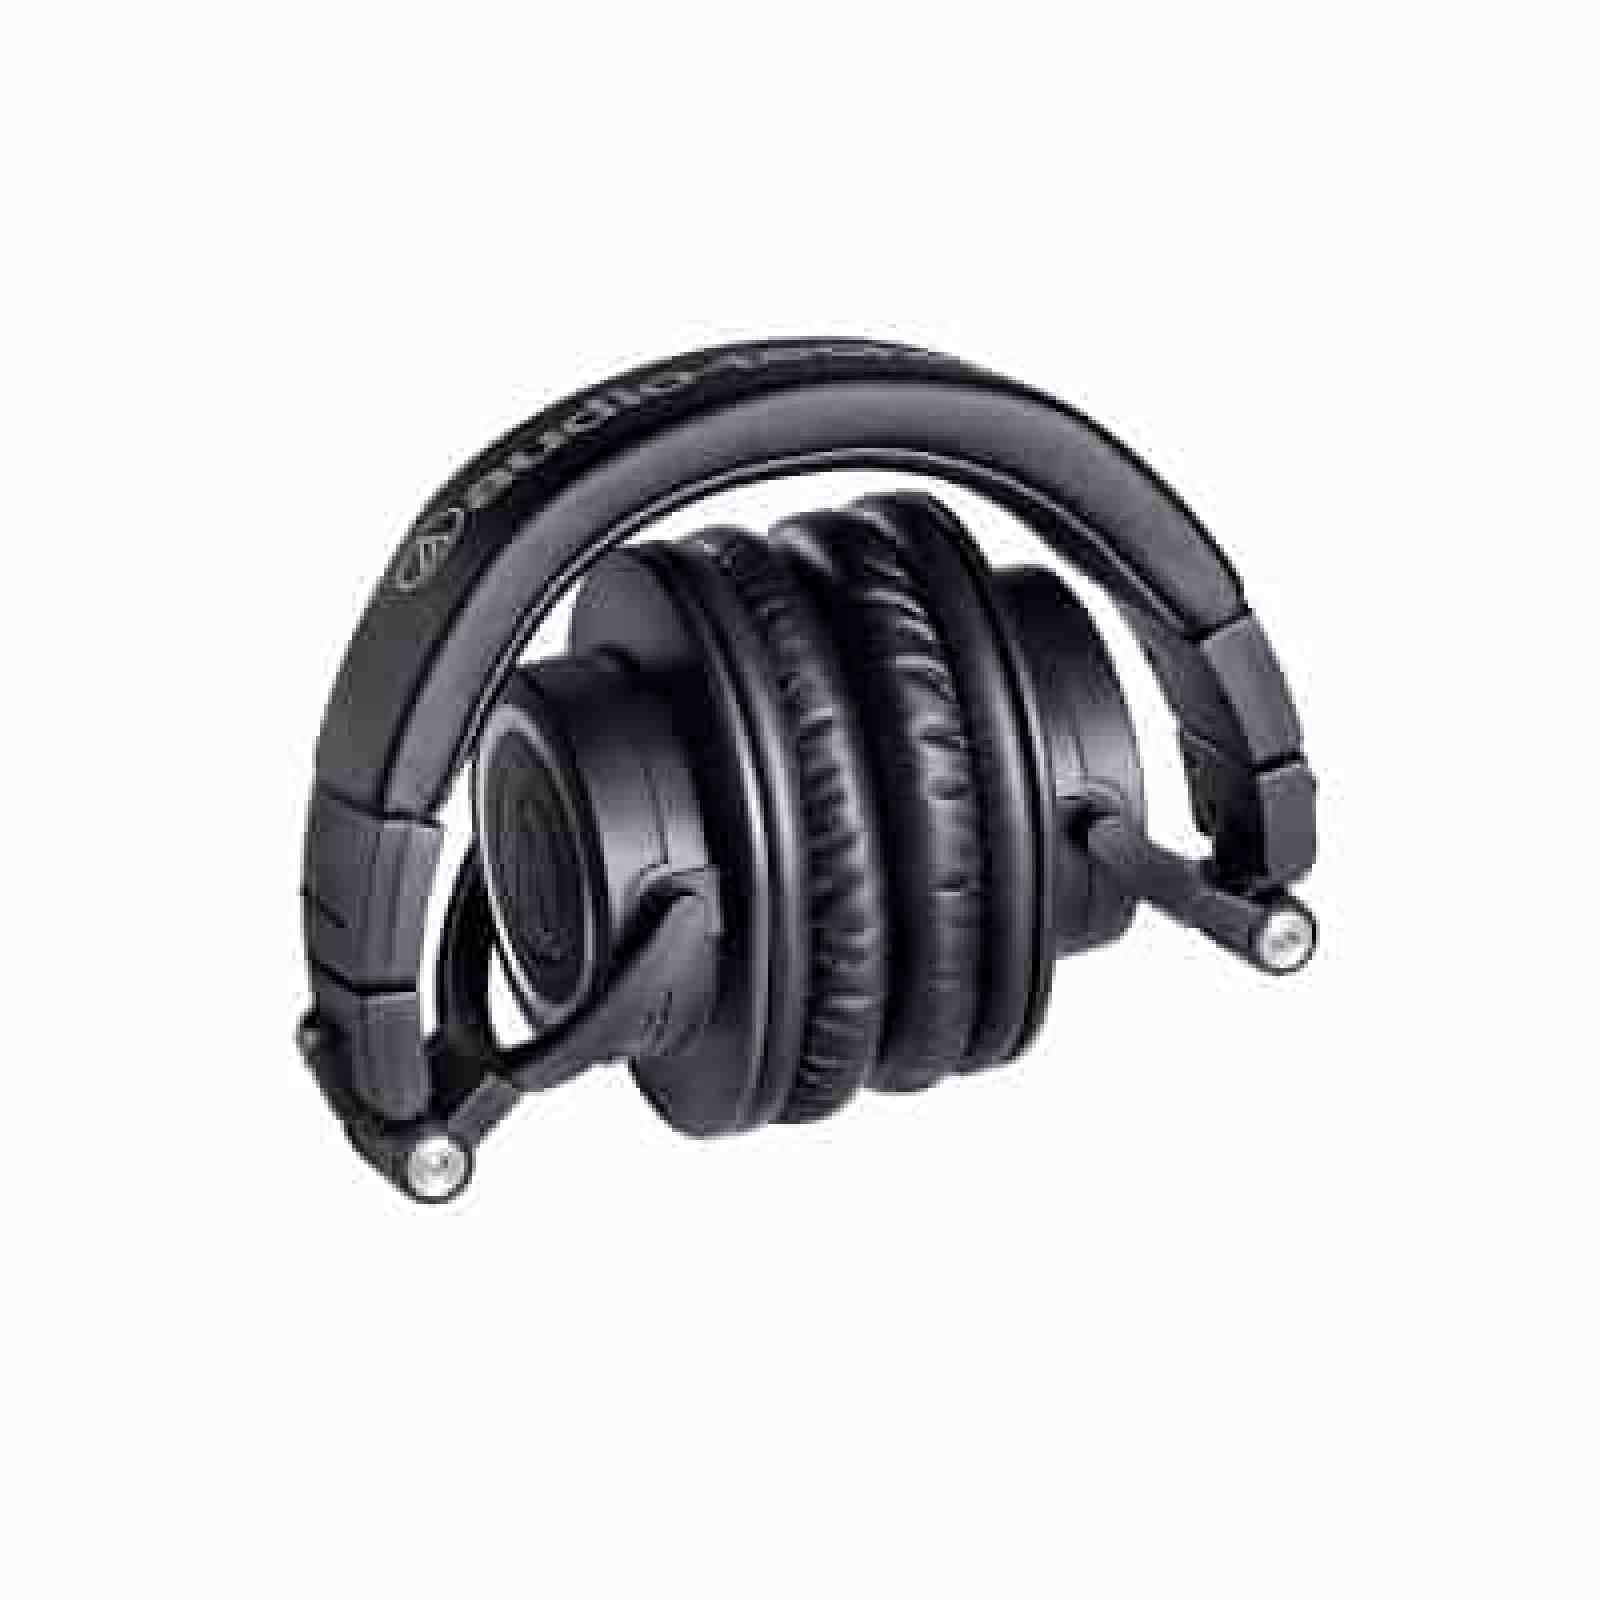 - ATH M50xBT 3 2 - Audio Technica นำหูฟังรุ่นยอดนิยม ATH-M50x มาทำใหม่ในรูปแบบไร้สาย เตรียมวางจำหน่ายในไทยราคา 7,690 บาท